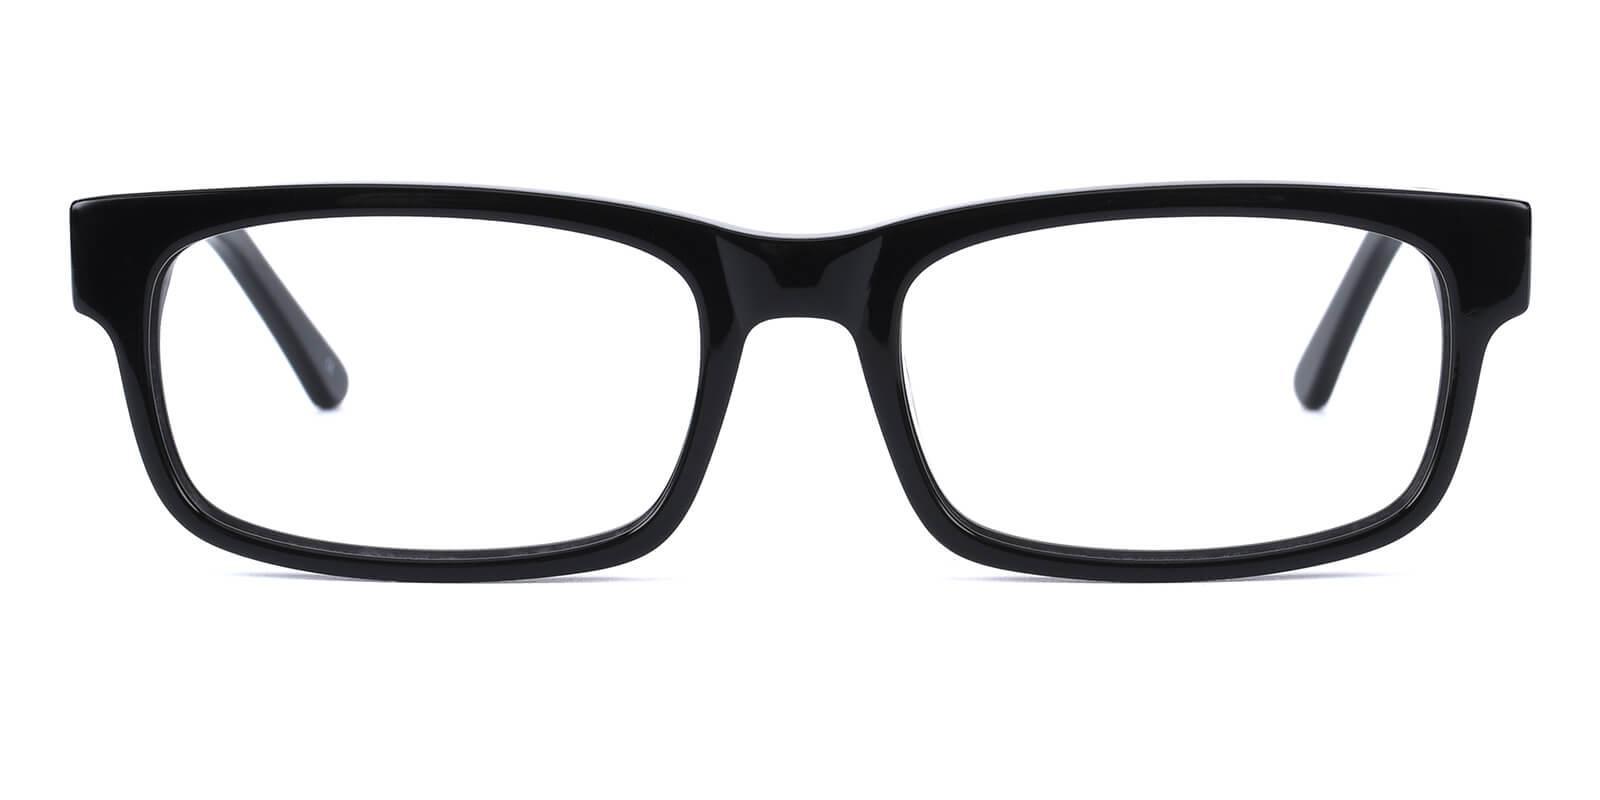 Eware-Black-Rectangle-Acetate-Eyeglasses-additional2